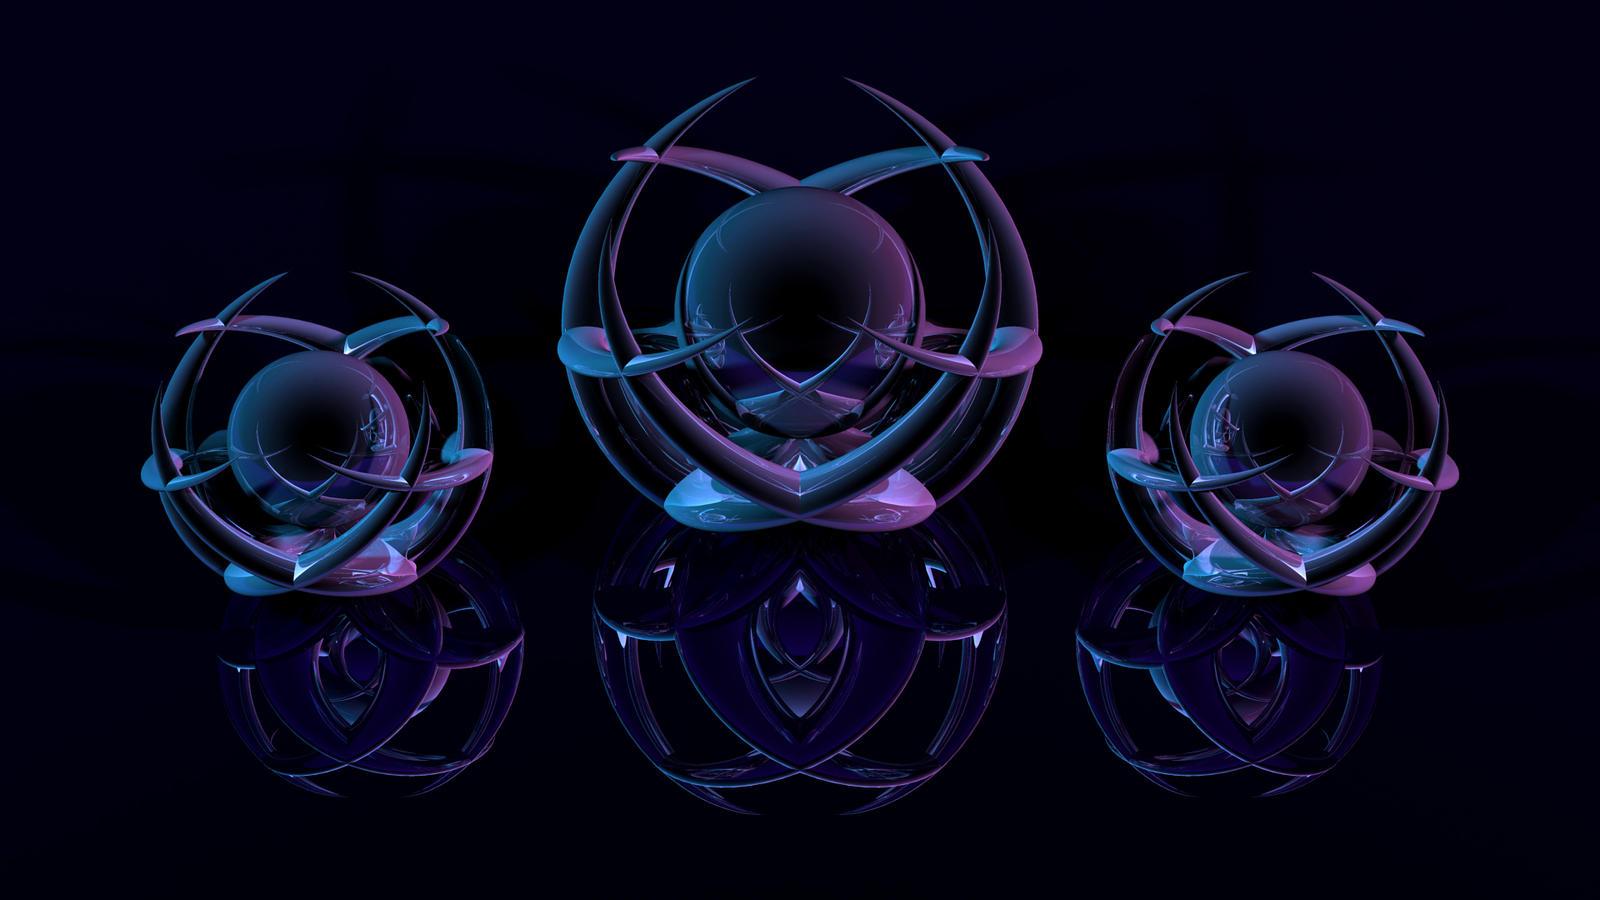 The Dark Nests by TylerXy